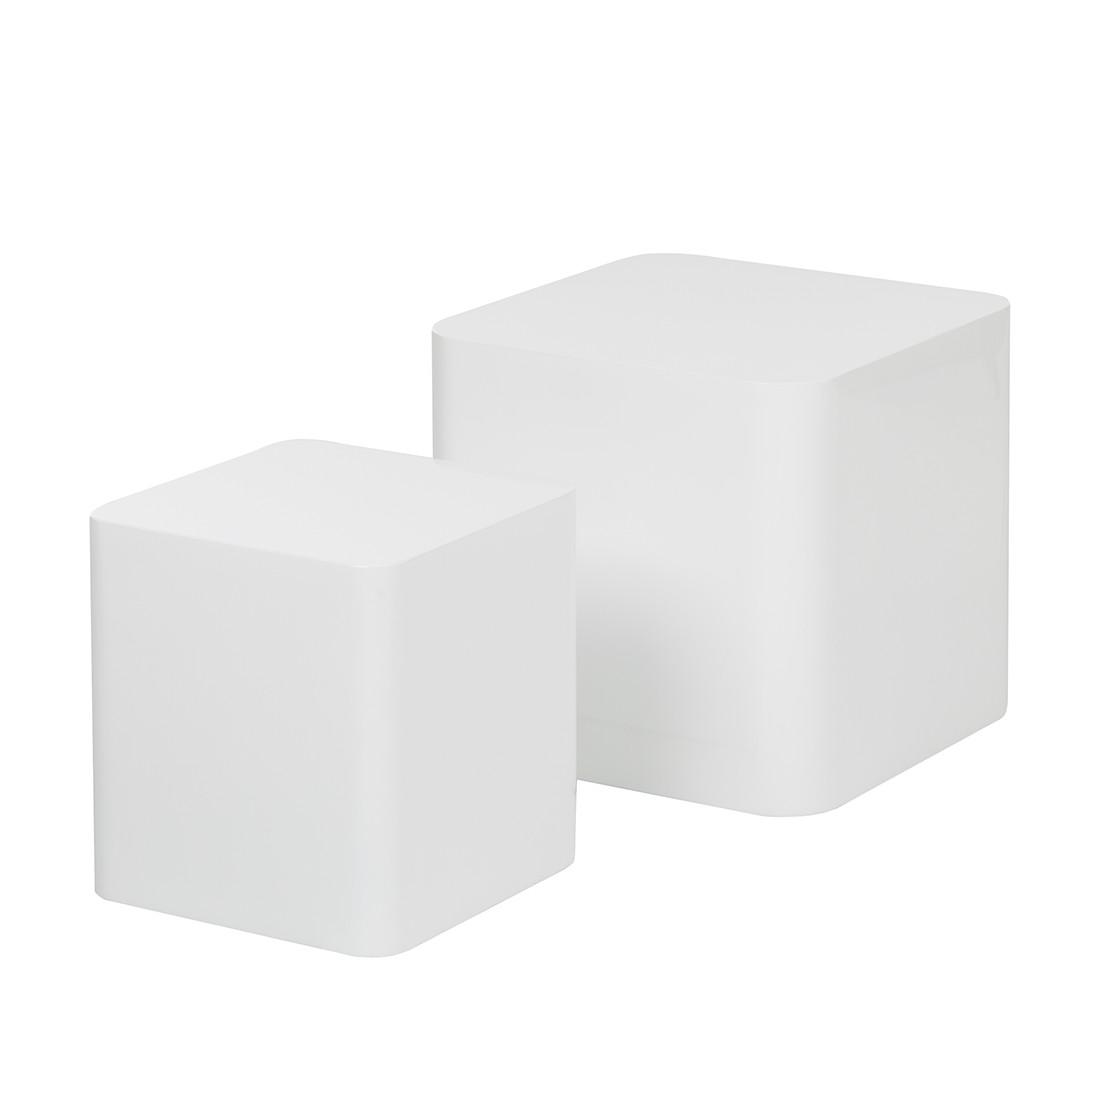 Bijzettafelset Square - wit hoogglans, Studio Monroe